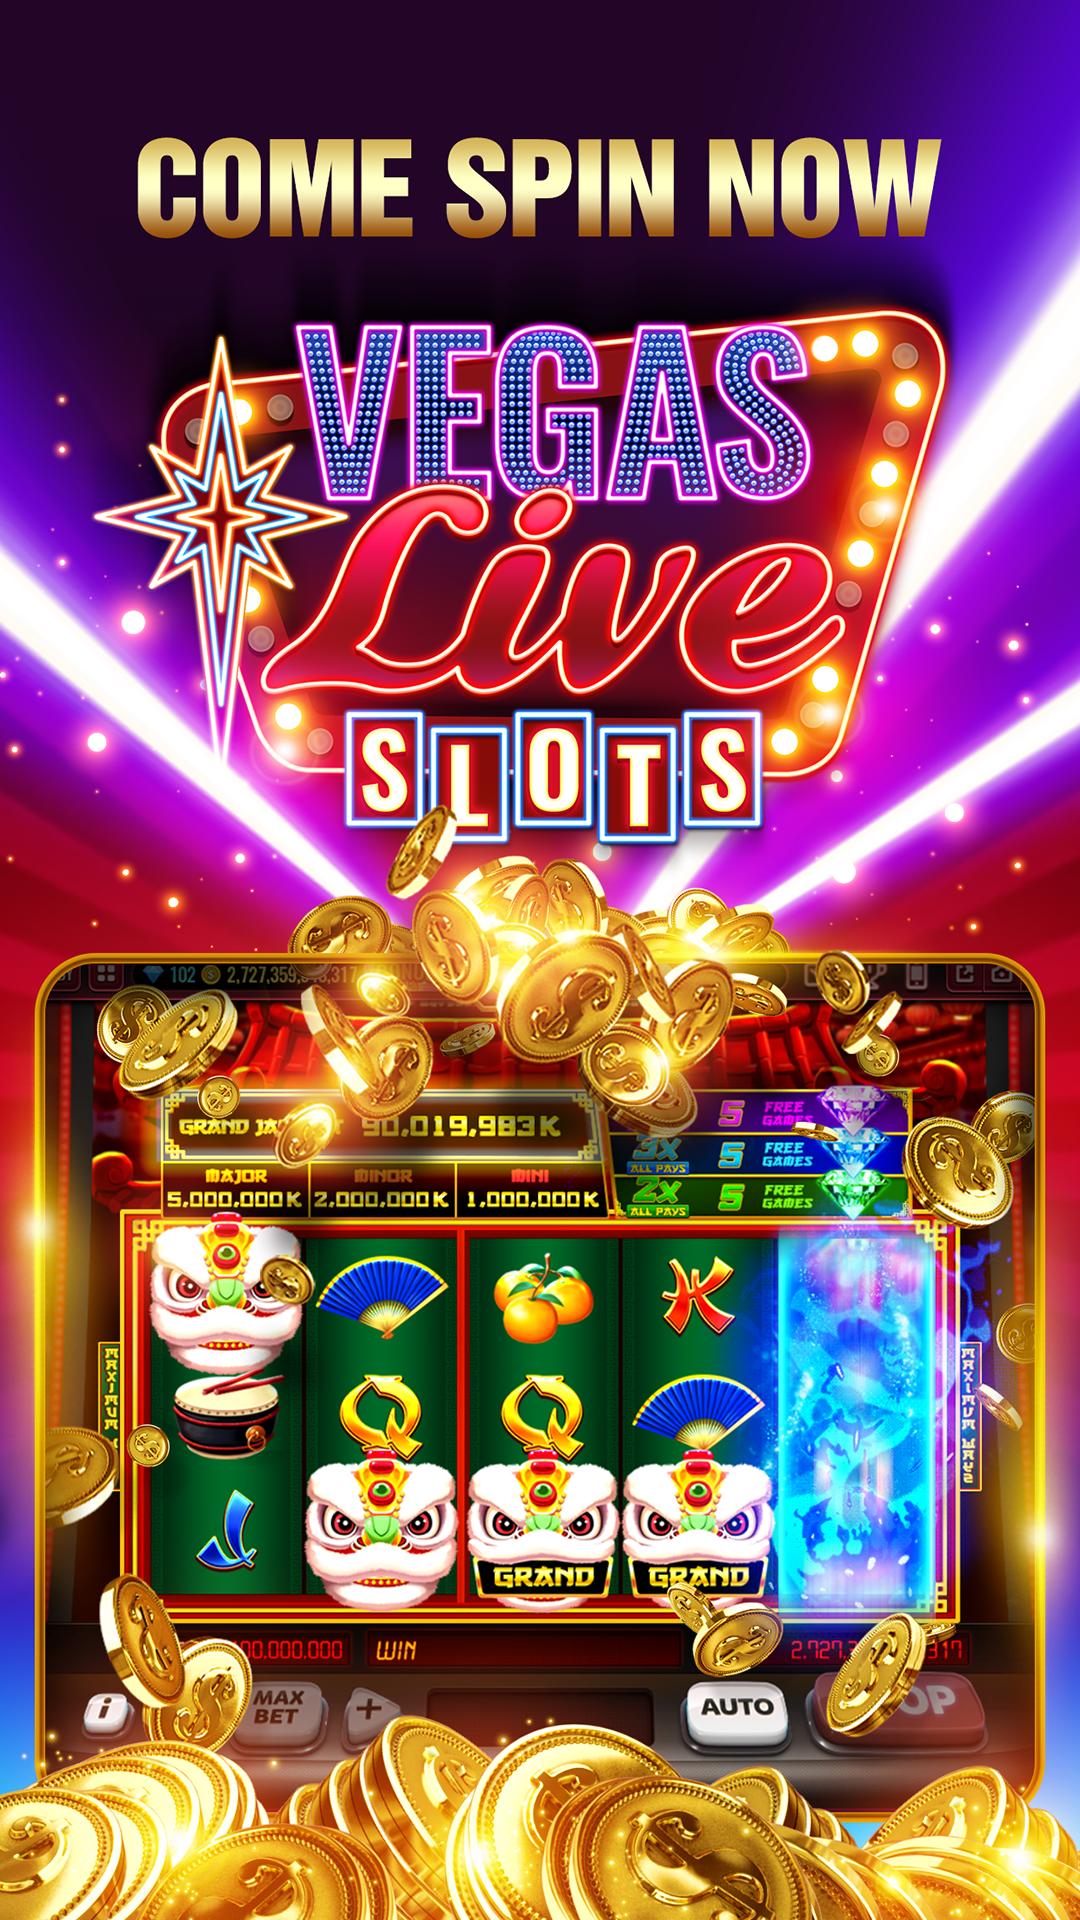 www slots com gratis darts